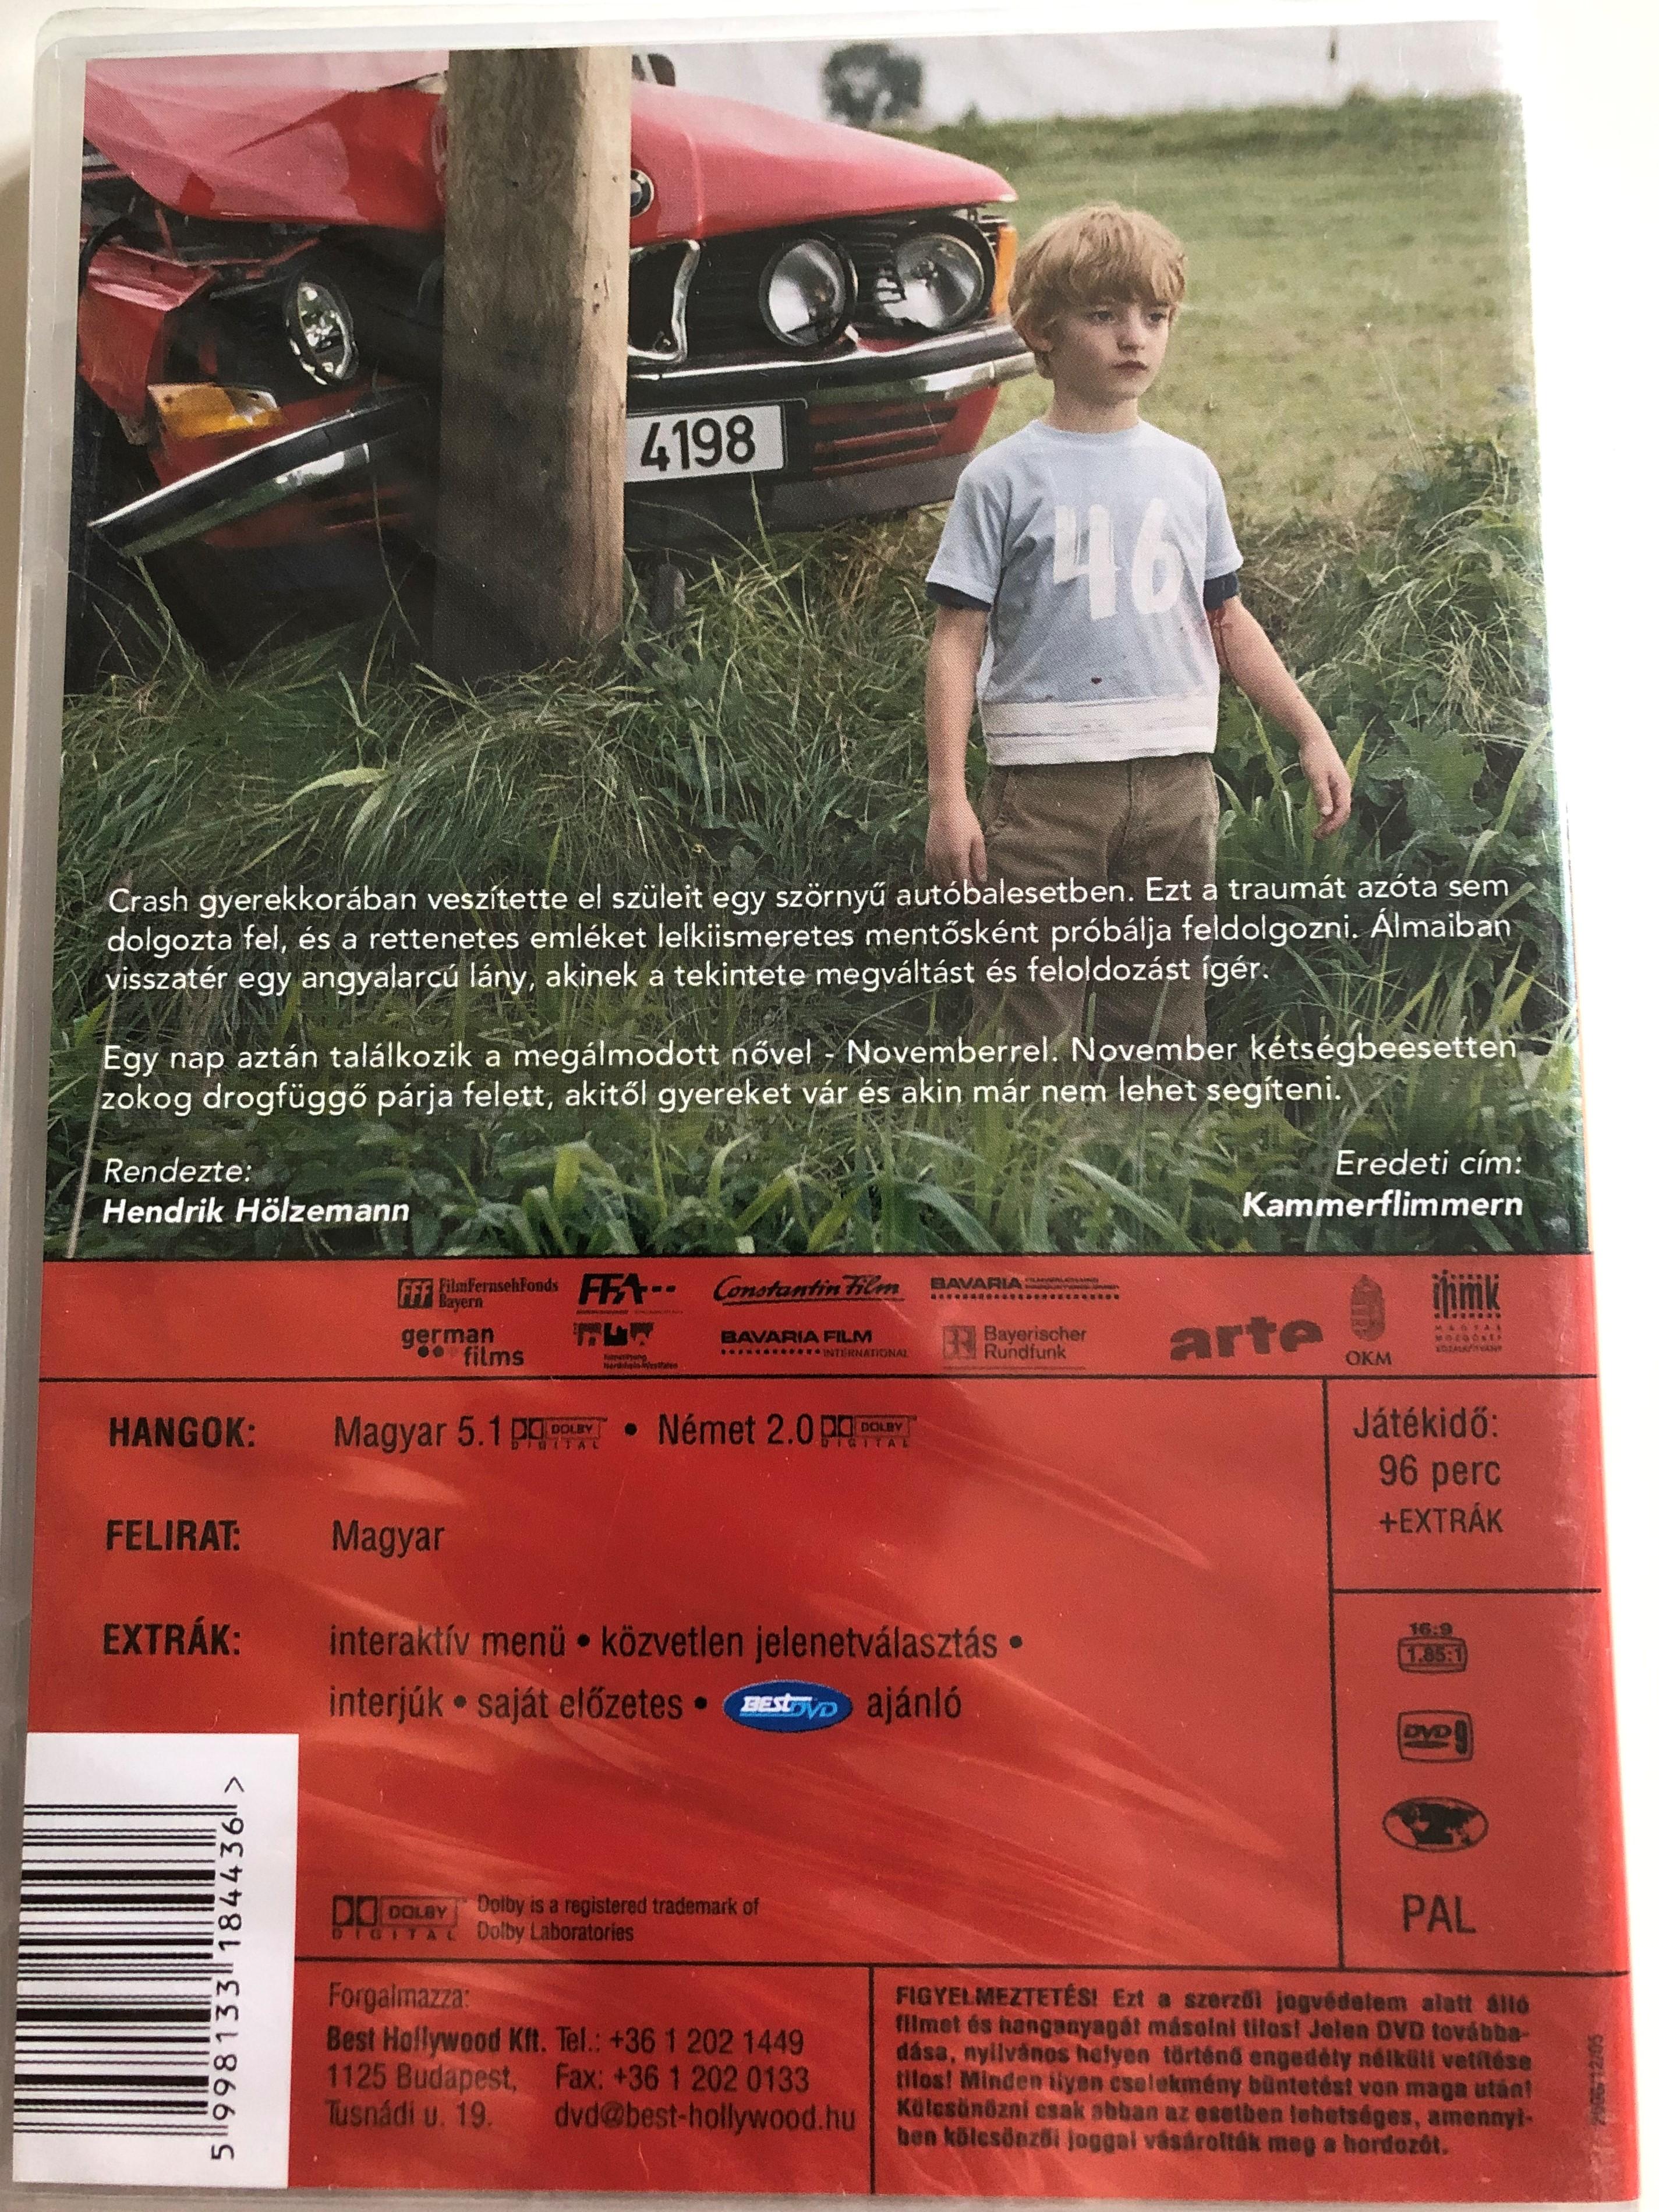 kammerflimmern-dvd-2004-sz-vritmus-off-beat-2.jpg